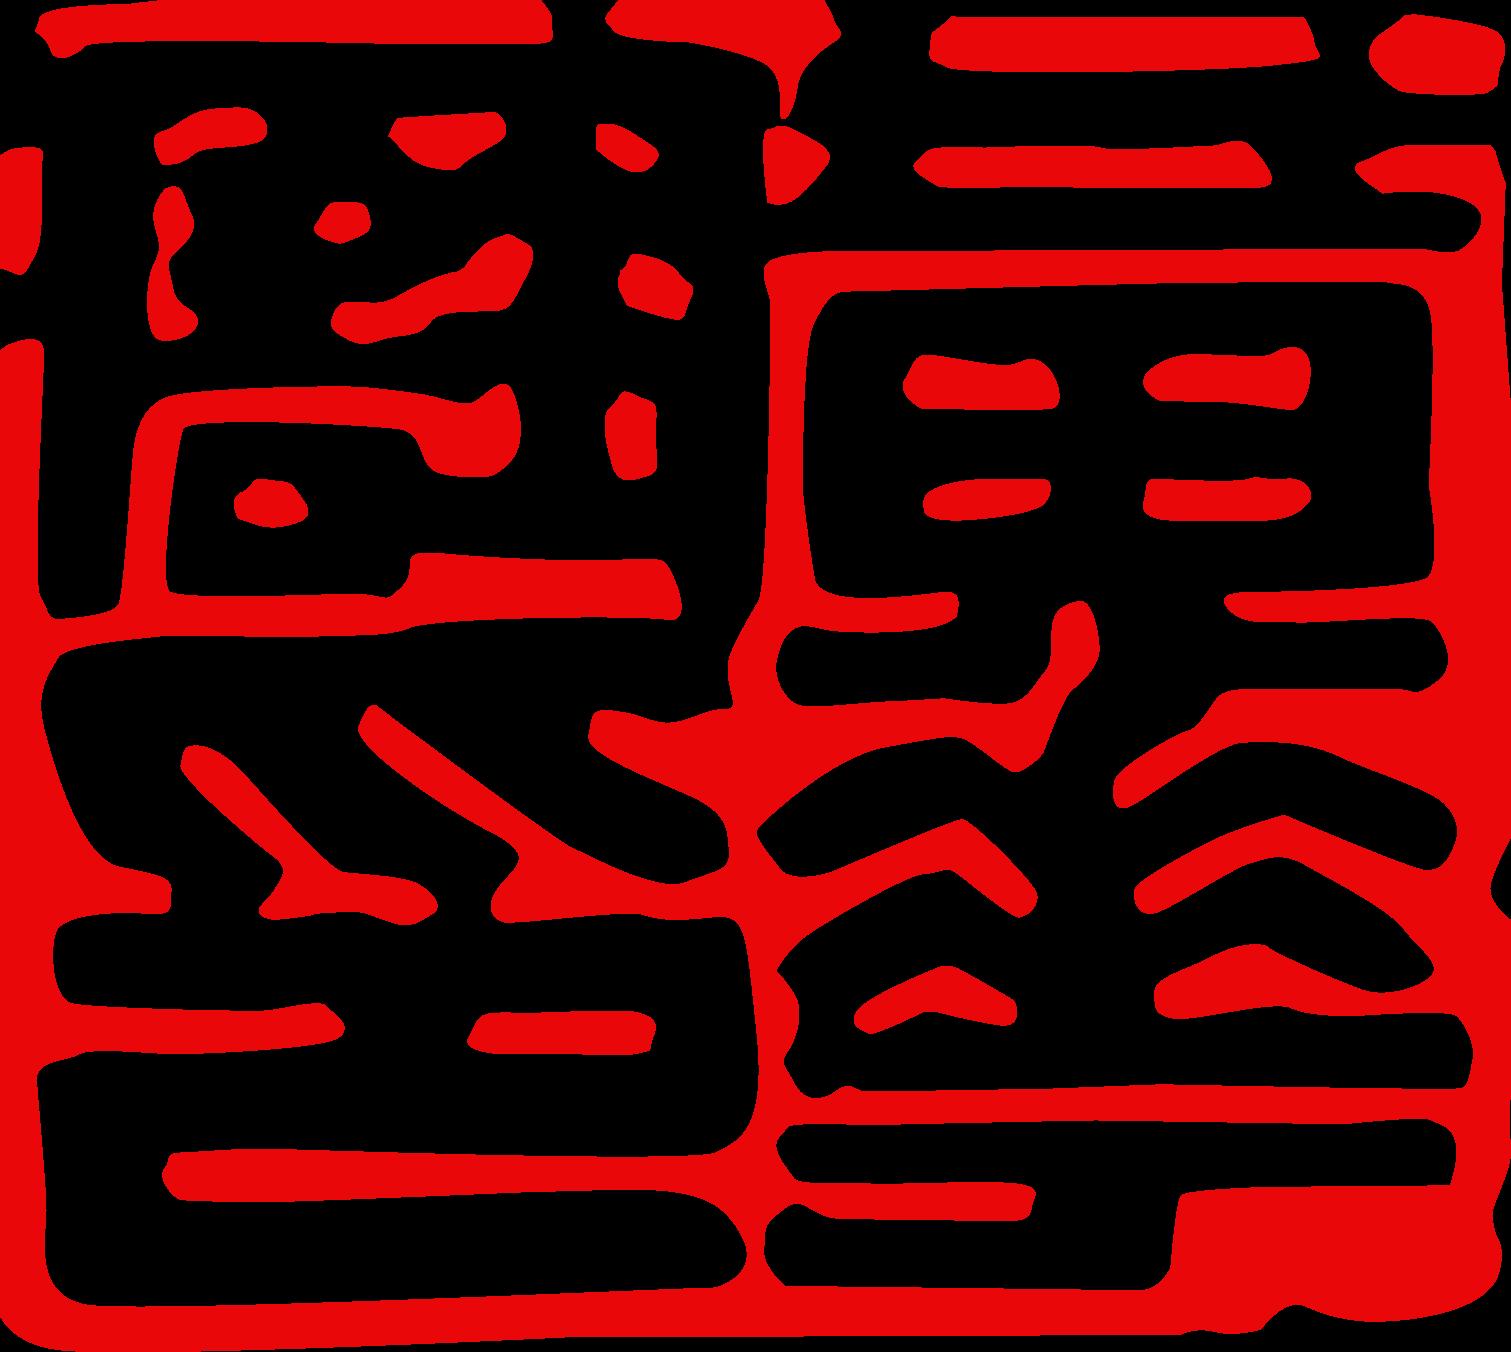 Wong Wah Po